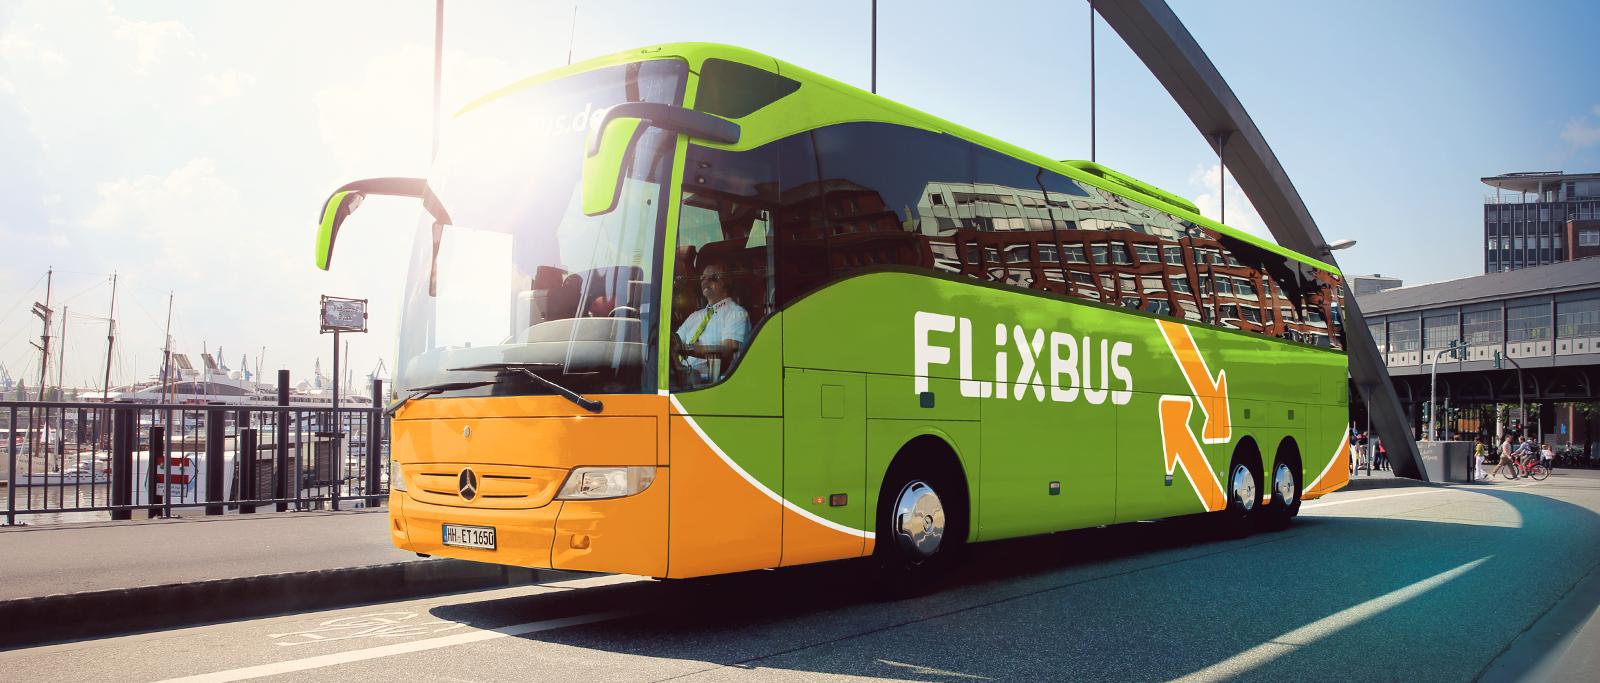 FlixBus on the street.